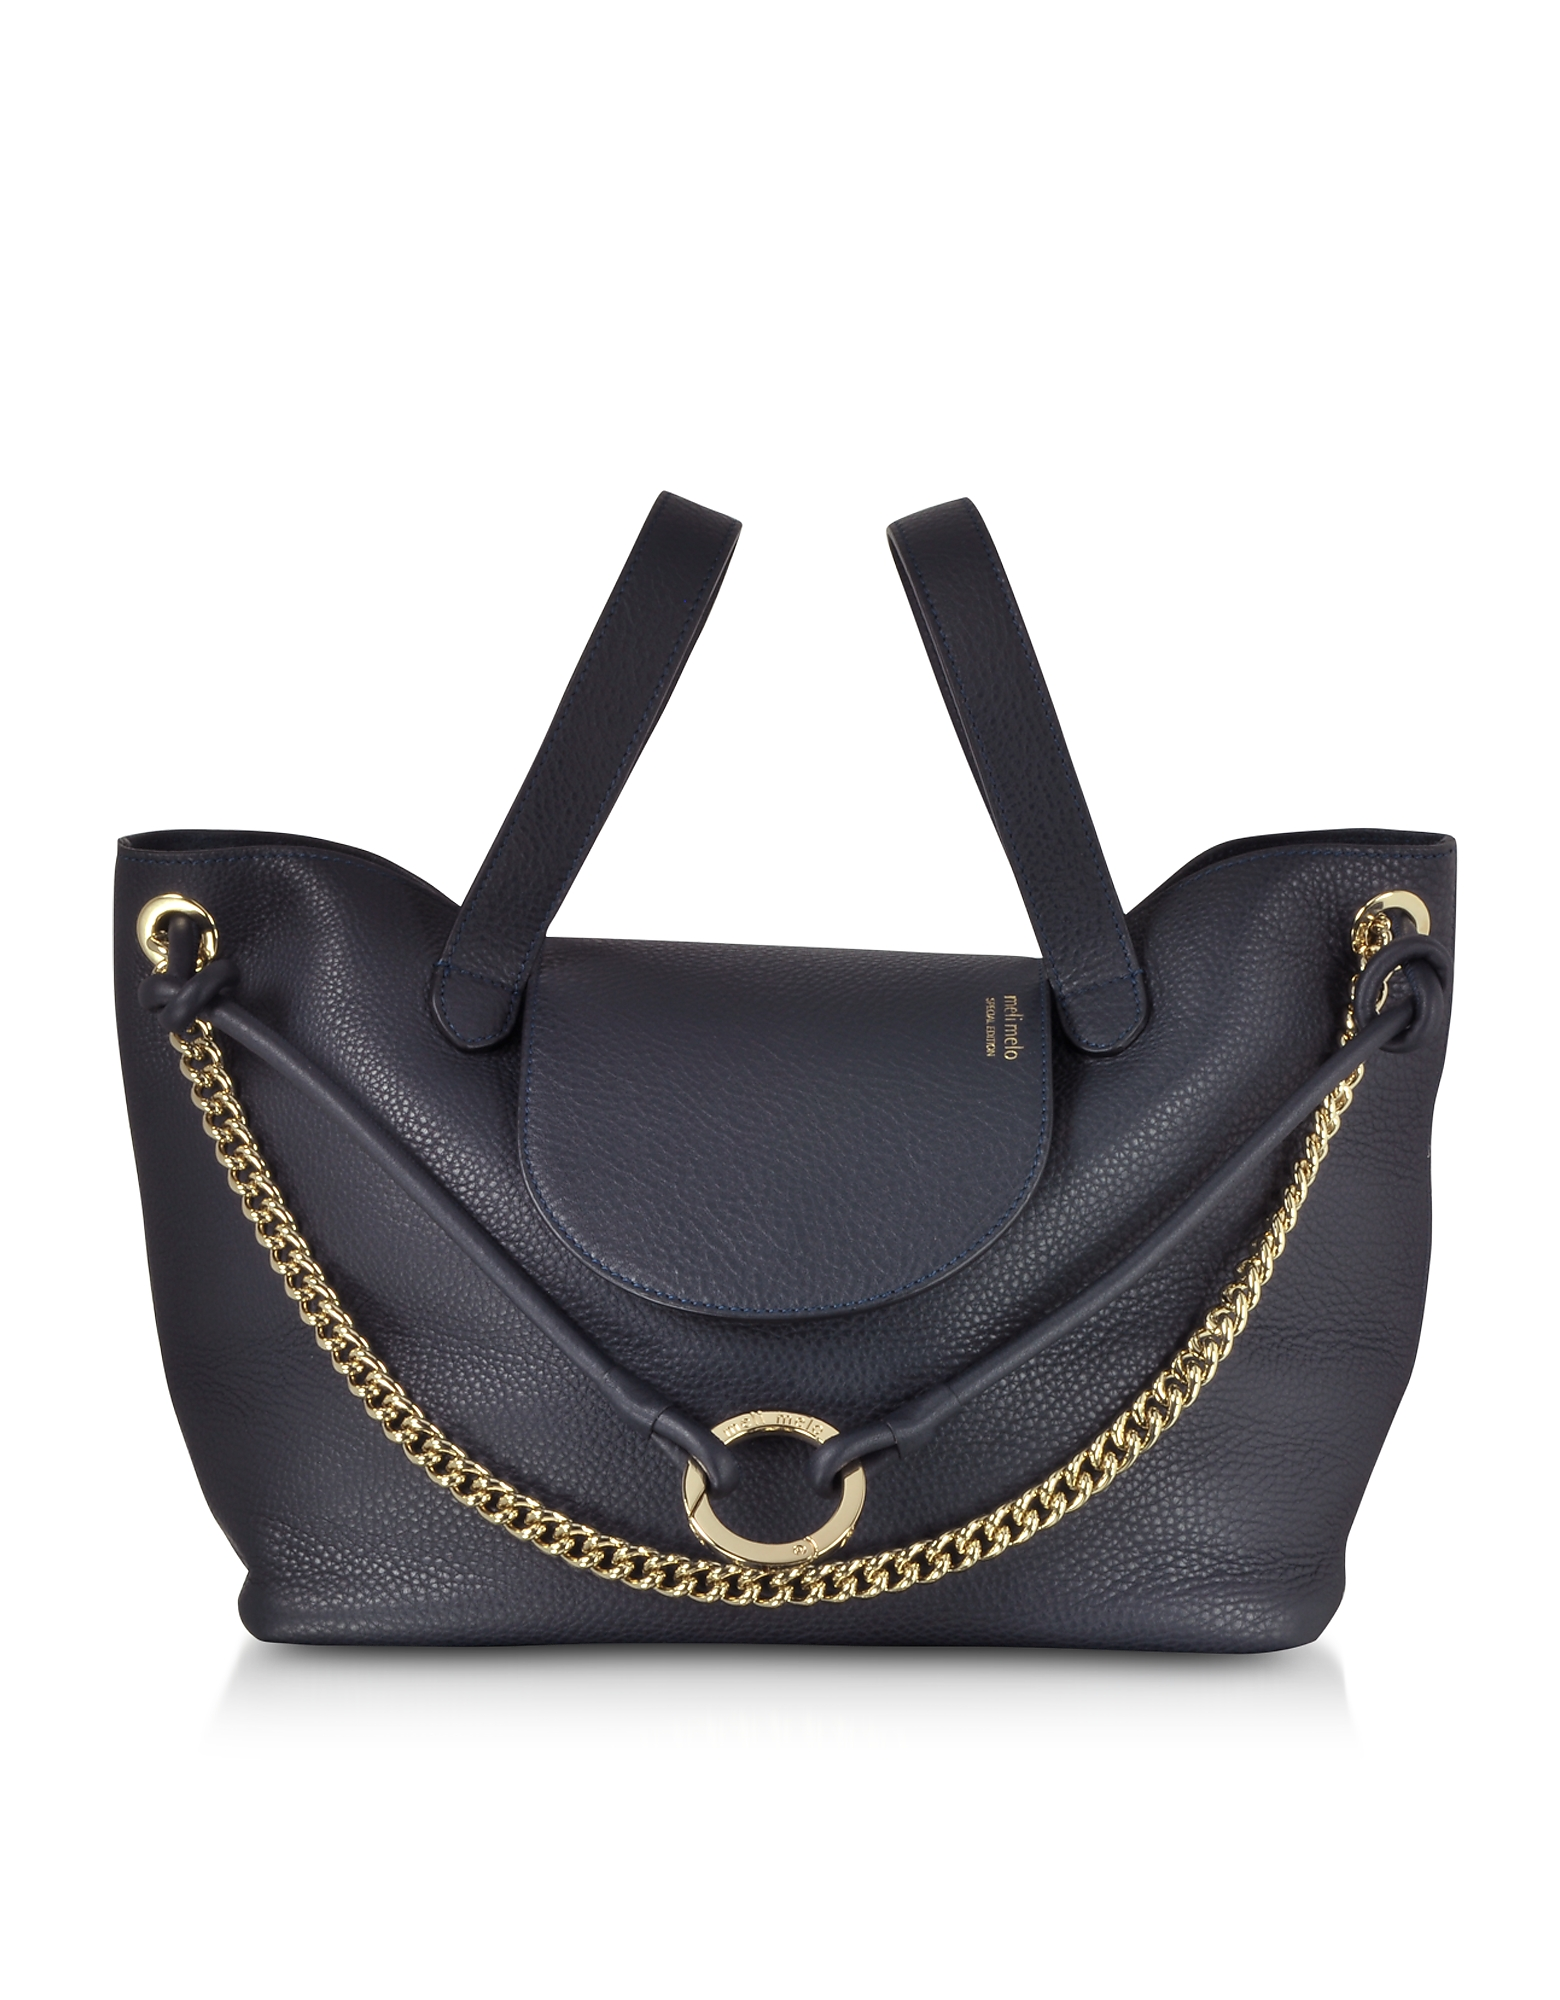 Image of Meli Melo Designer Handbags, Regal Blue Linked Thela Medium Tote Bag